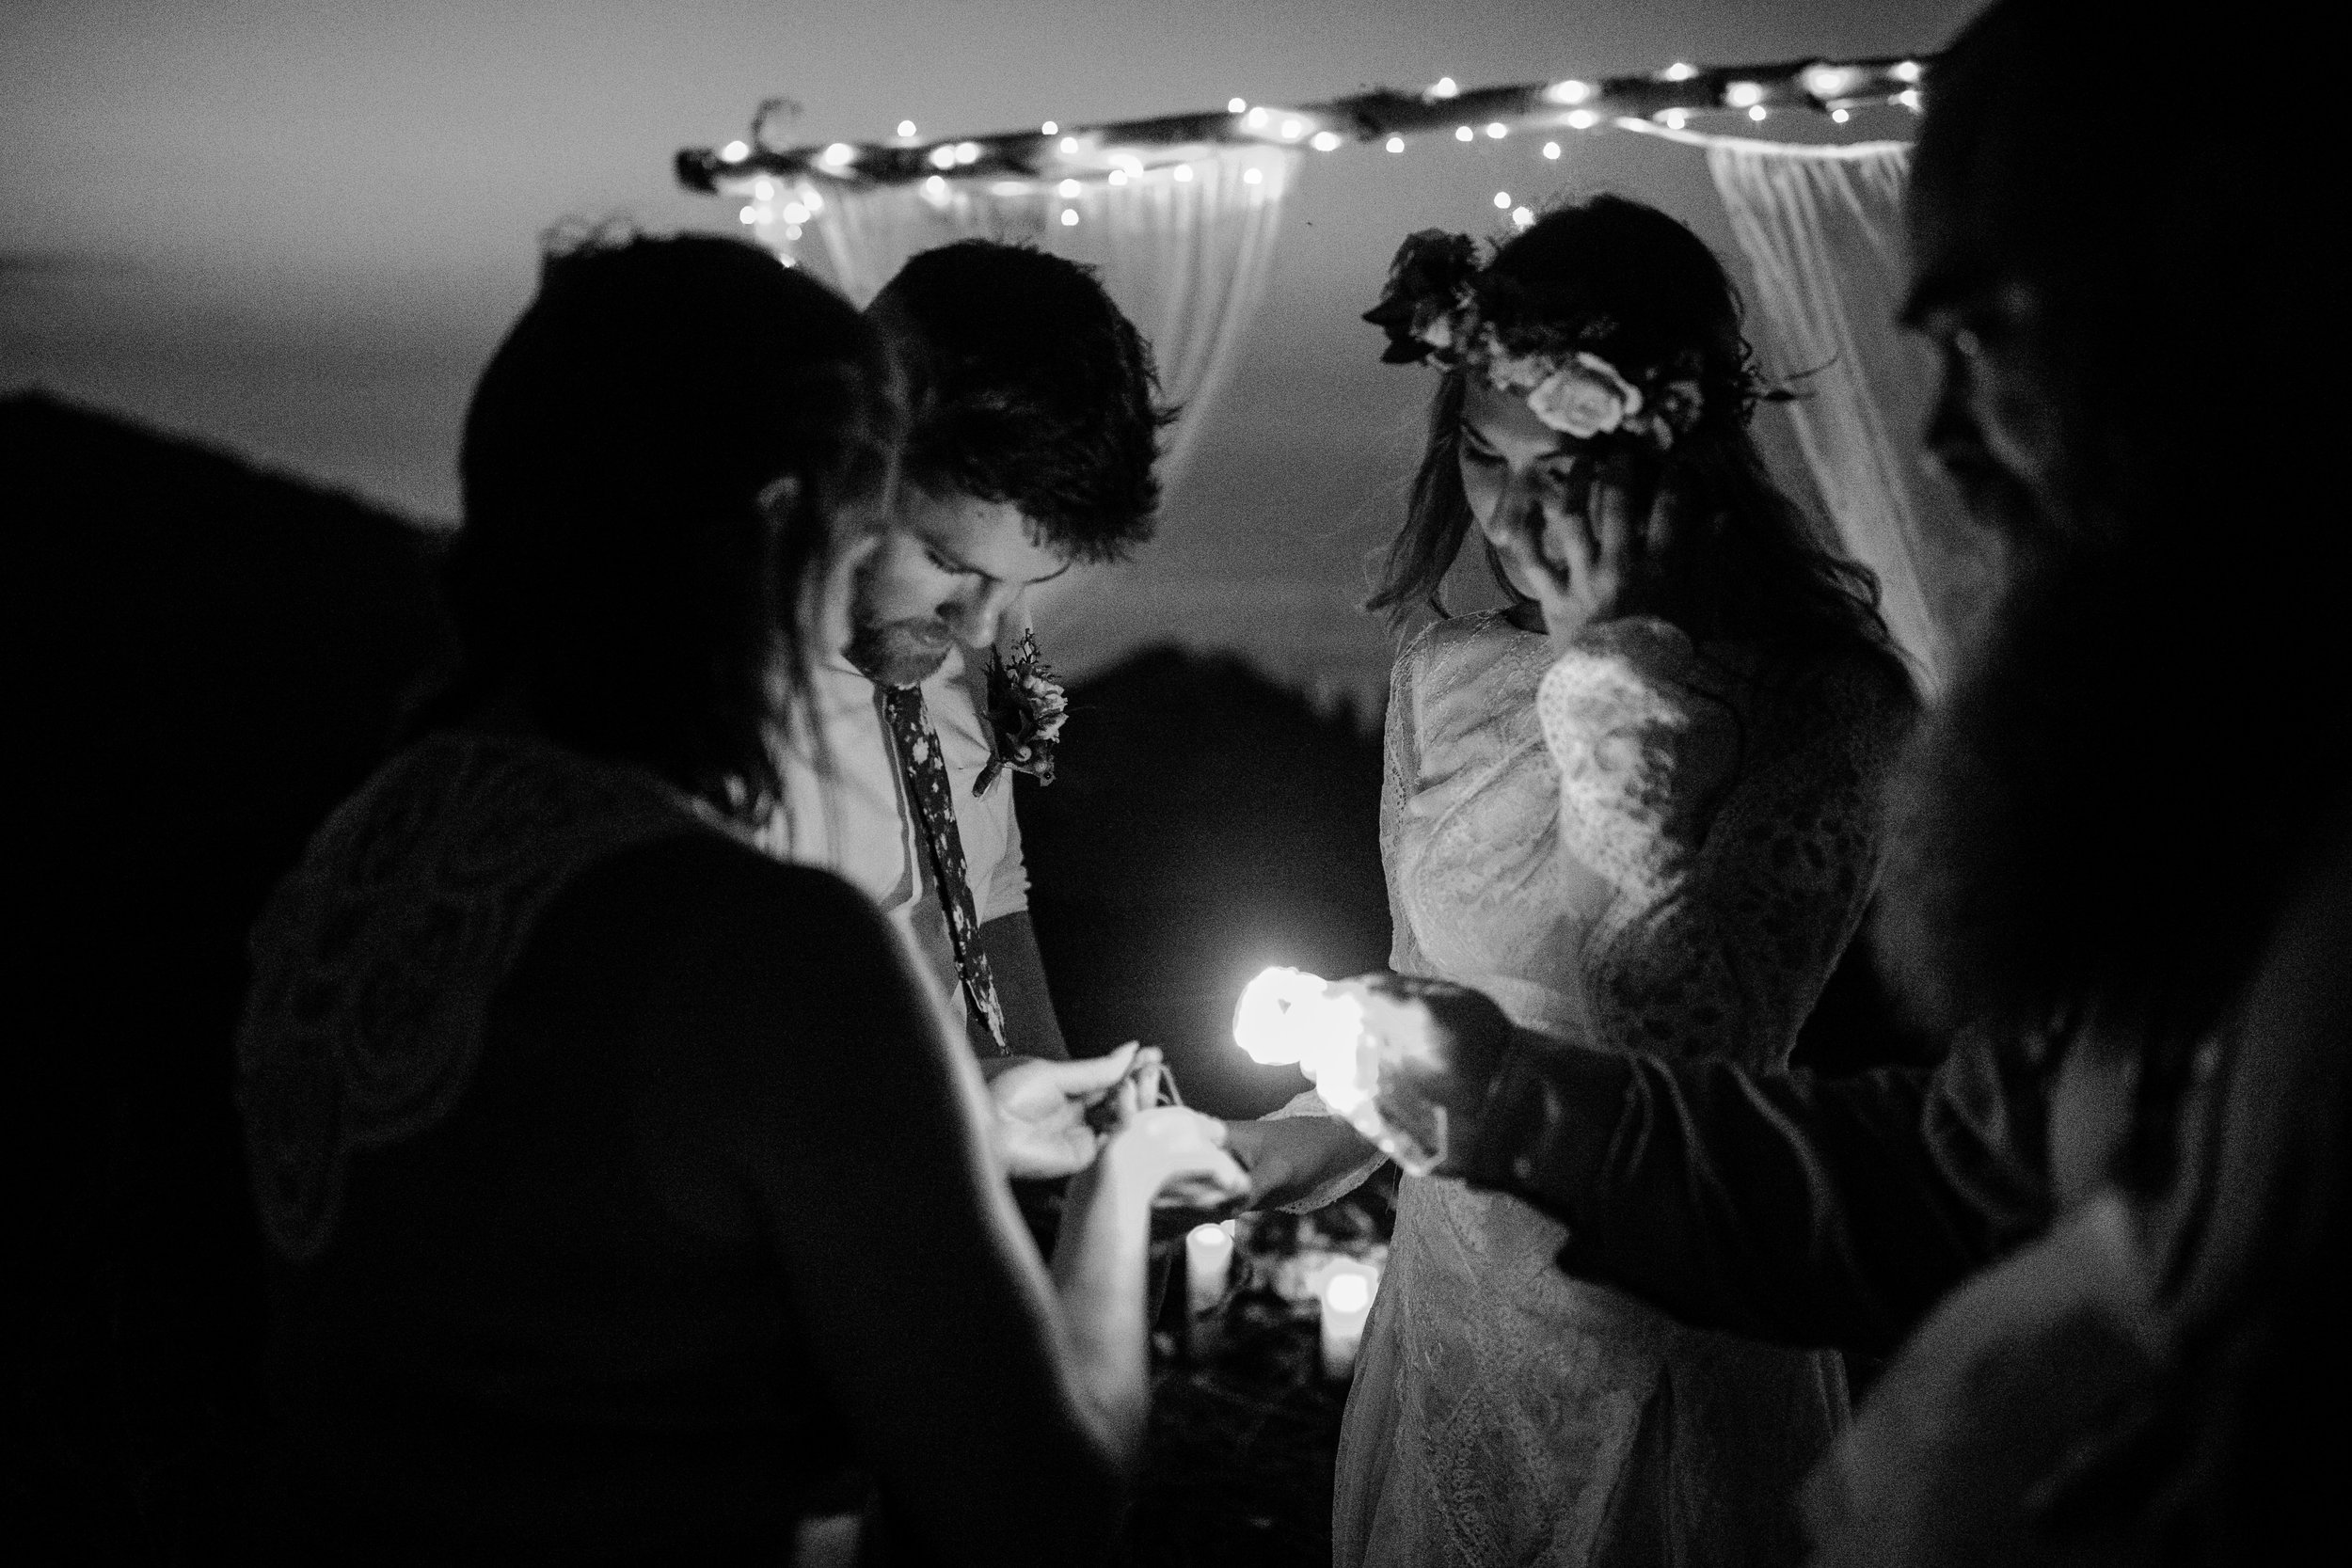 michigan-emotive-photographer-moonlight-elopement-mariha-hunter-288.jpg